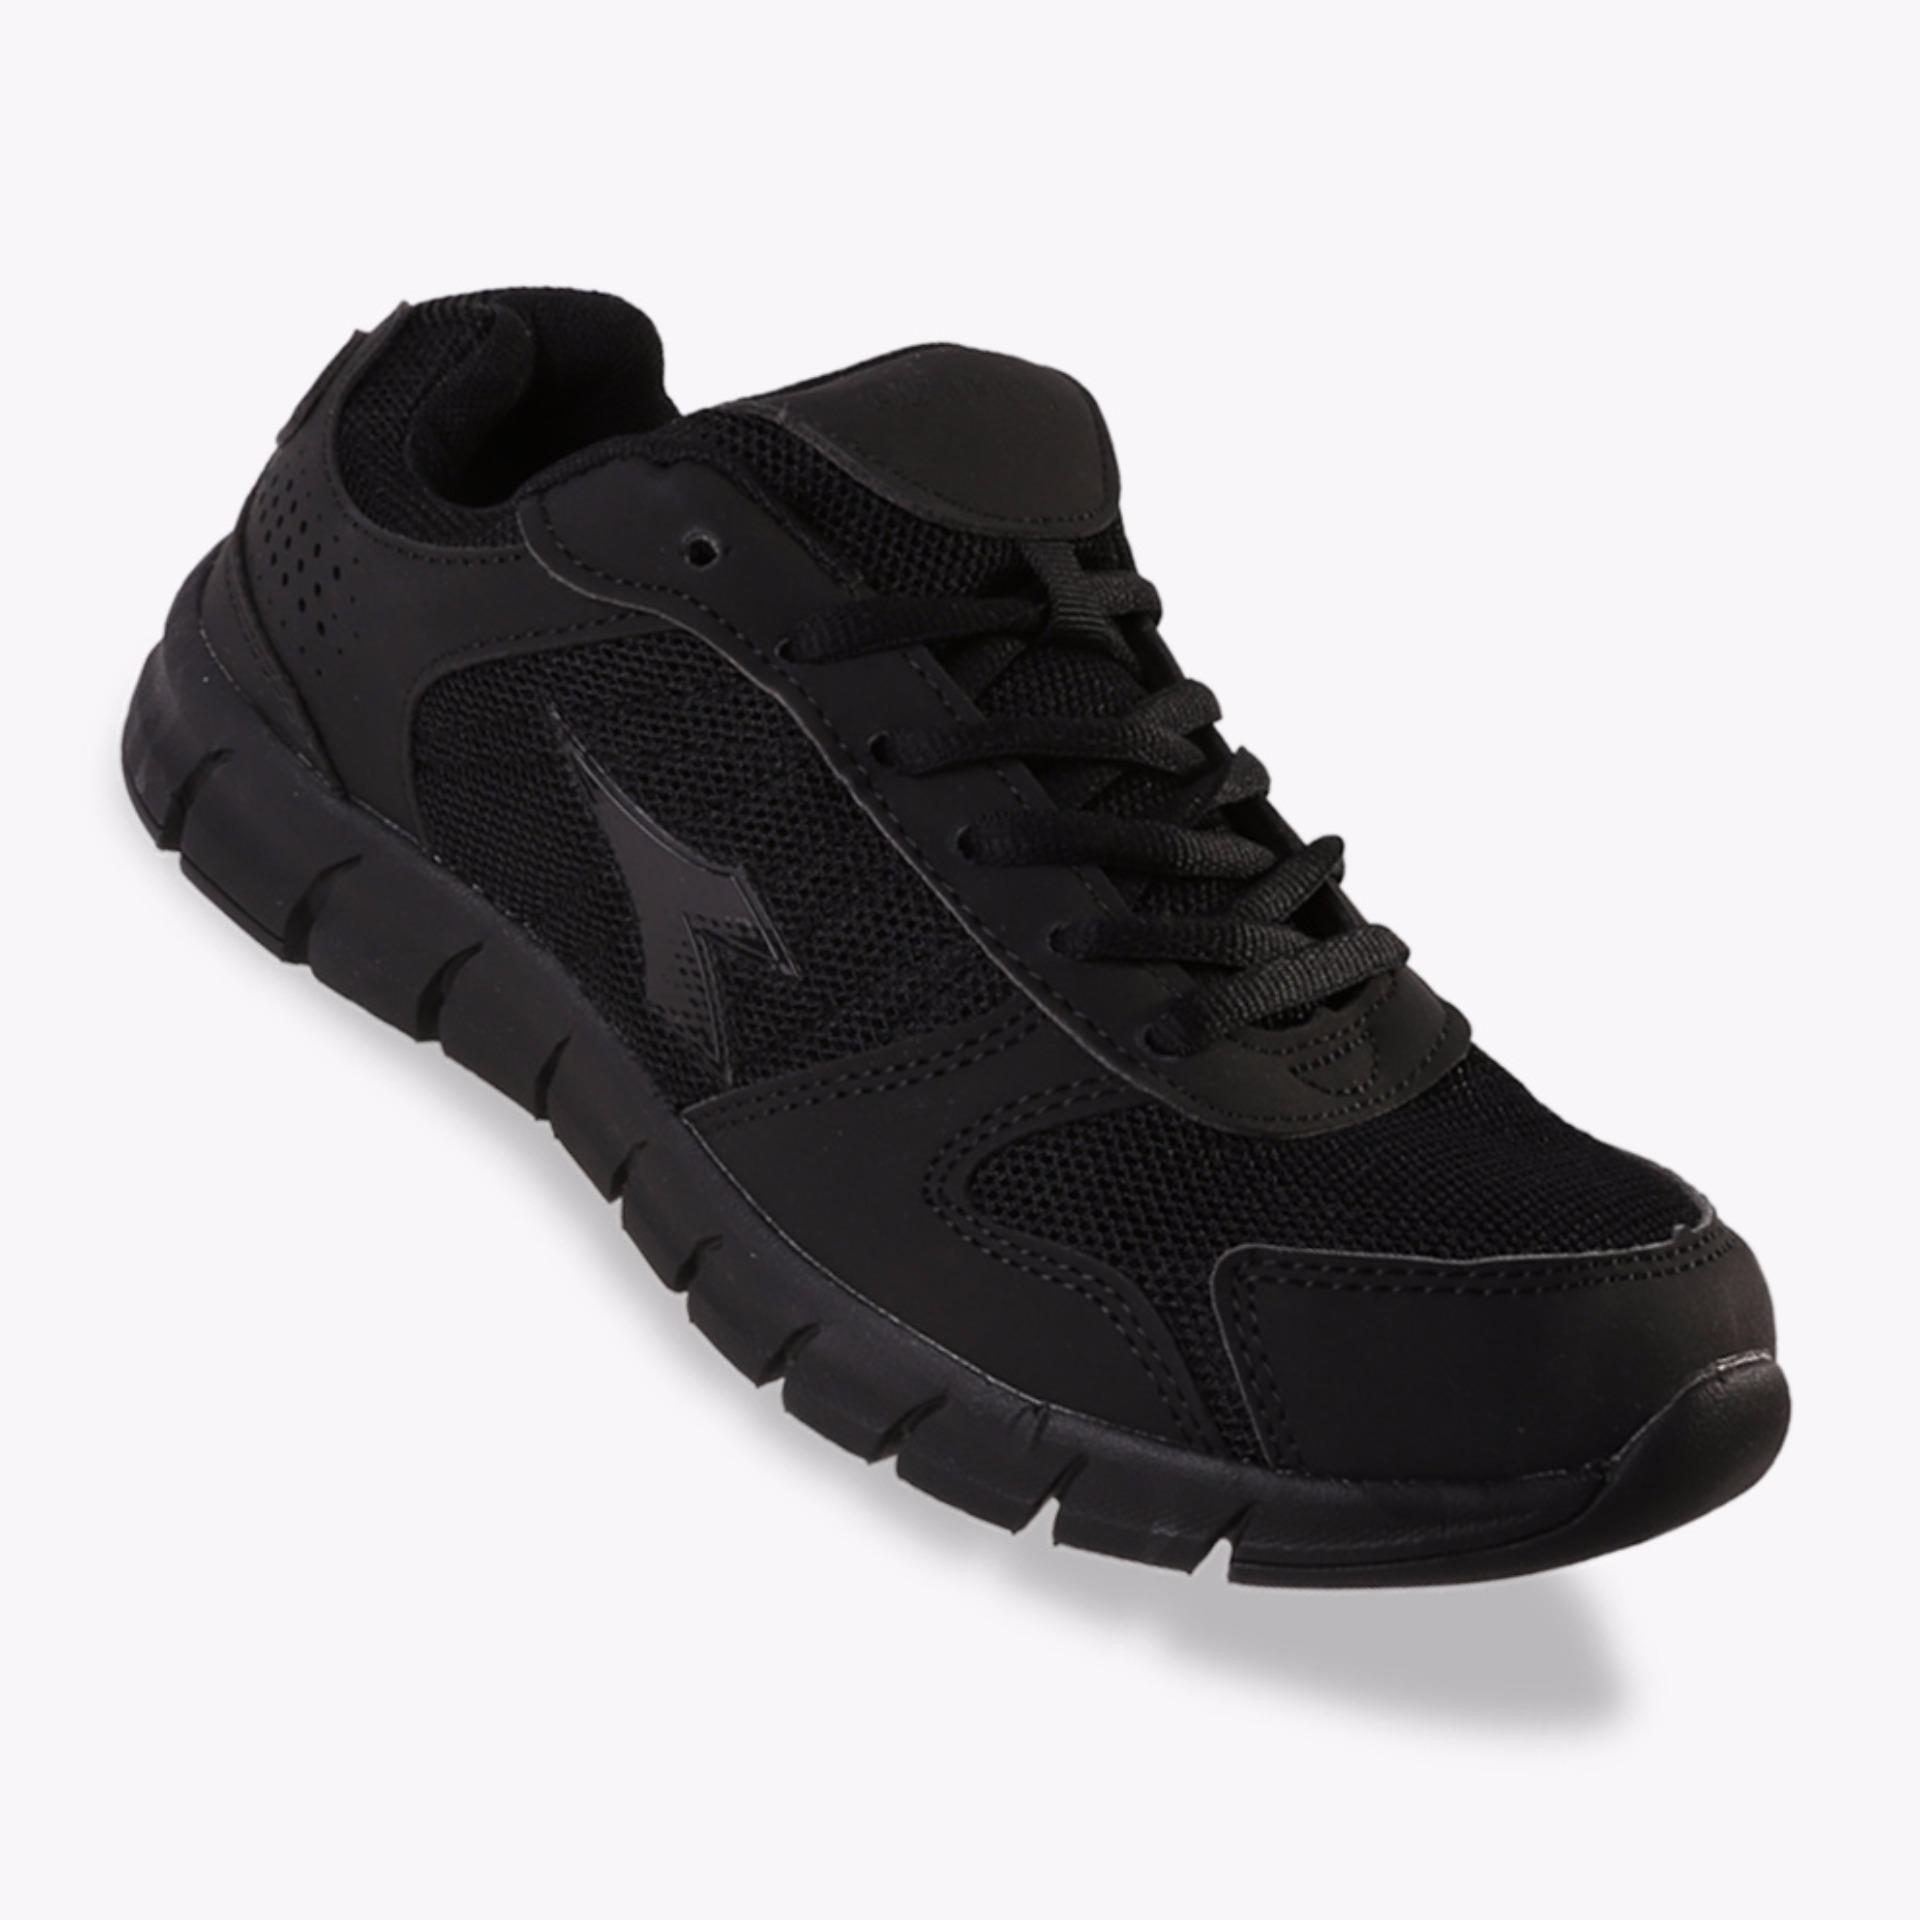 Harga Diadora Eno Kids Sch**l Shoes Hitam Yang Murah